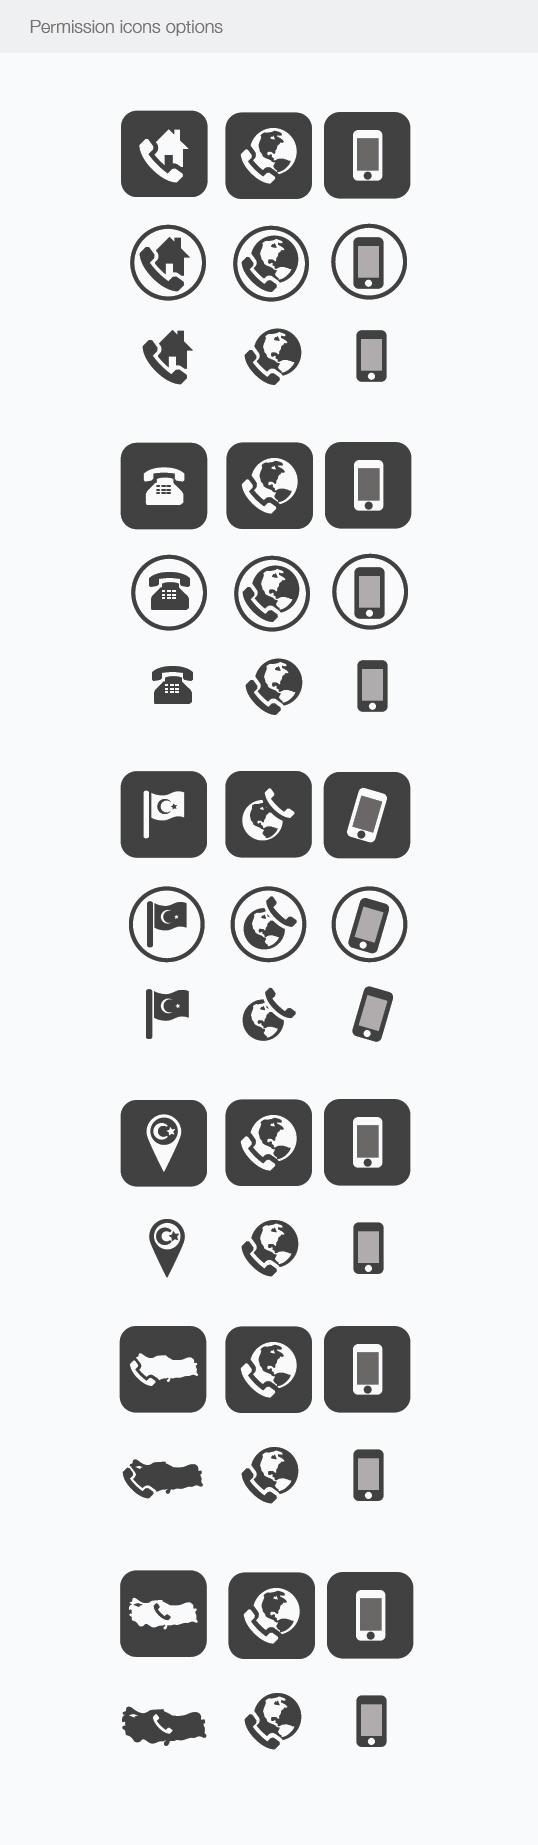 Bulutfon icons 2 02